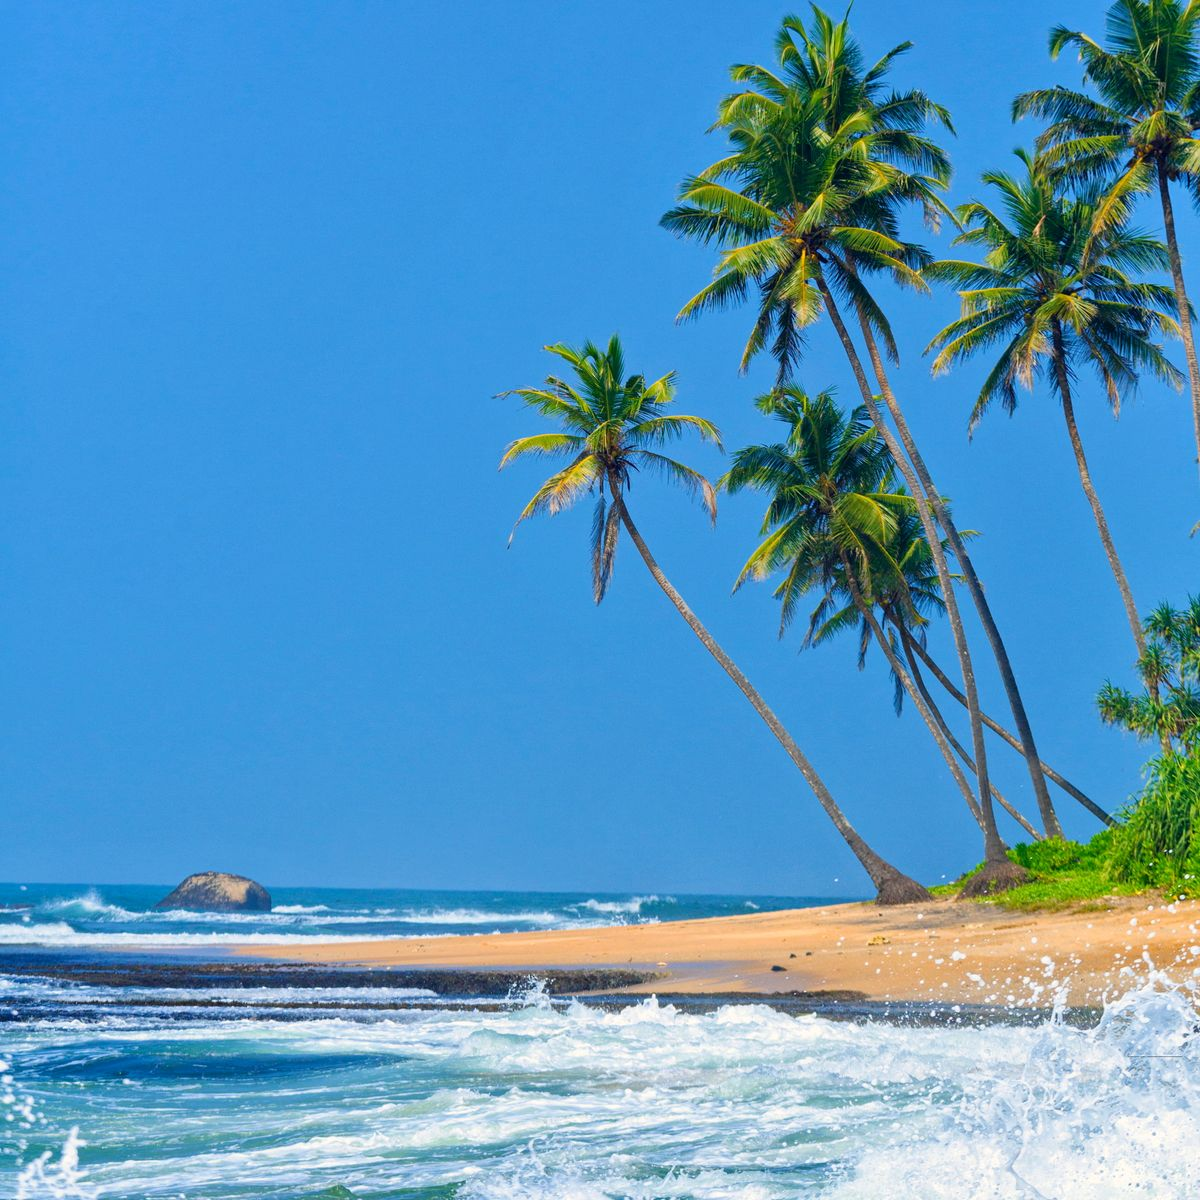 Tropical beach in Galle